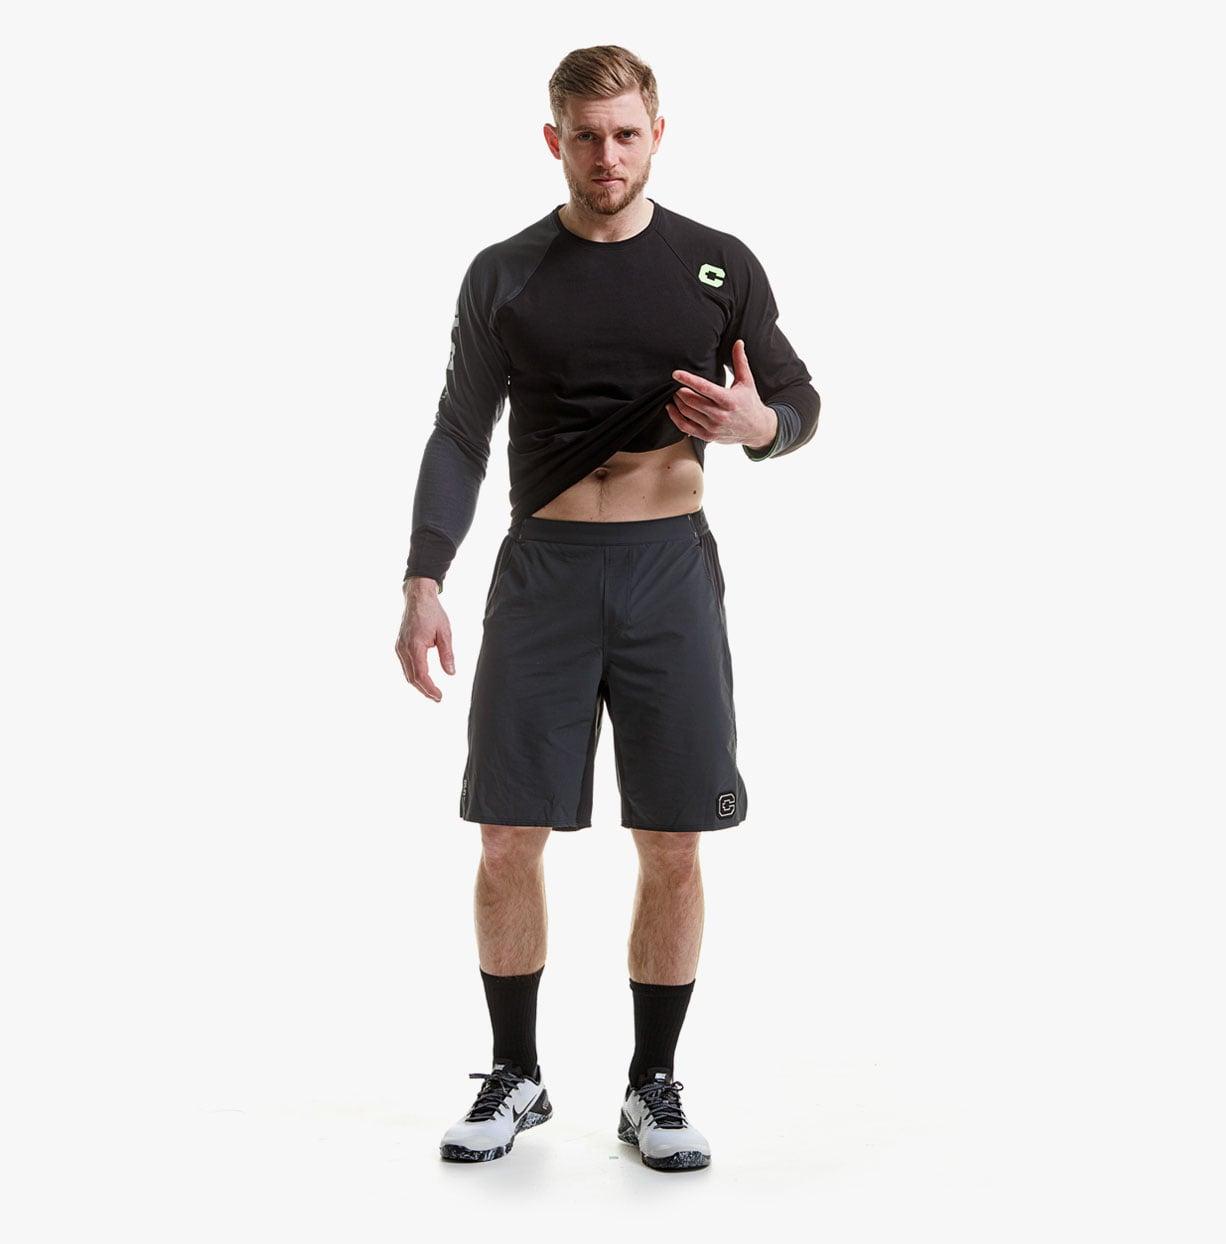 CLN-Launch-Shorts---DK-grey-1